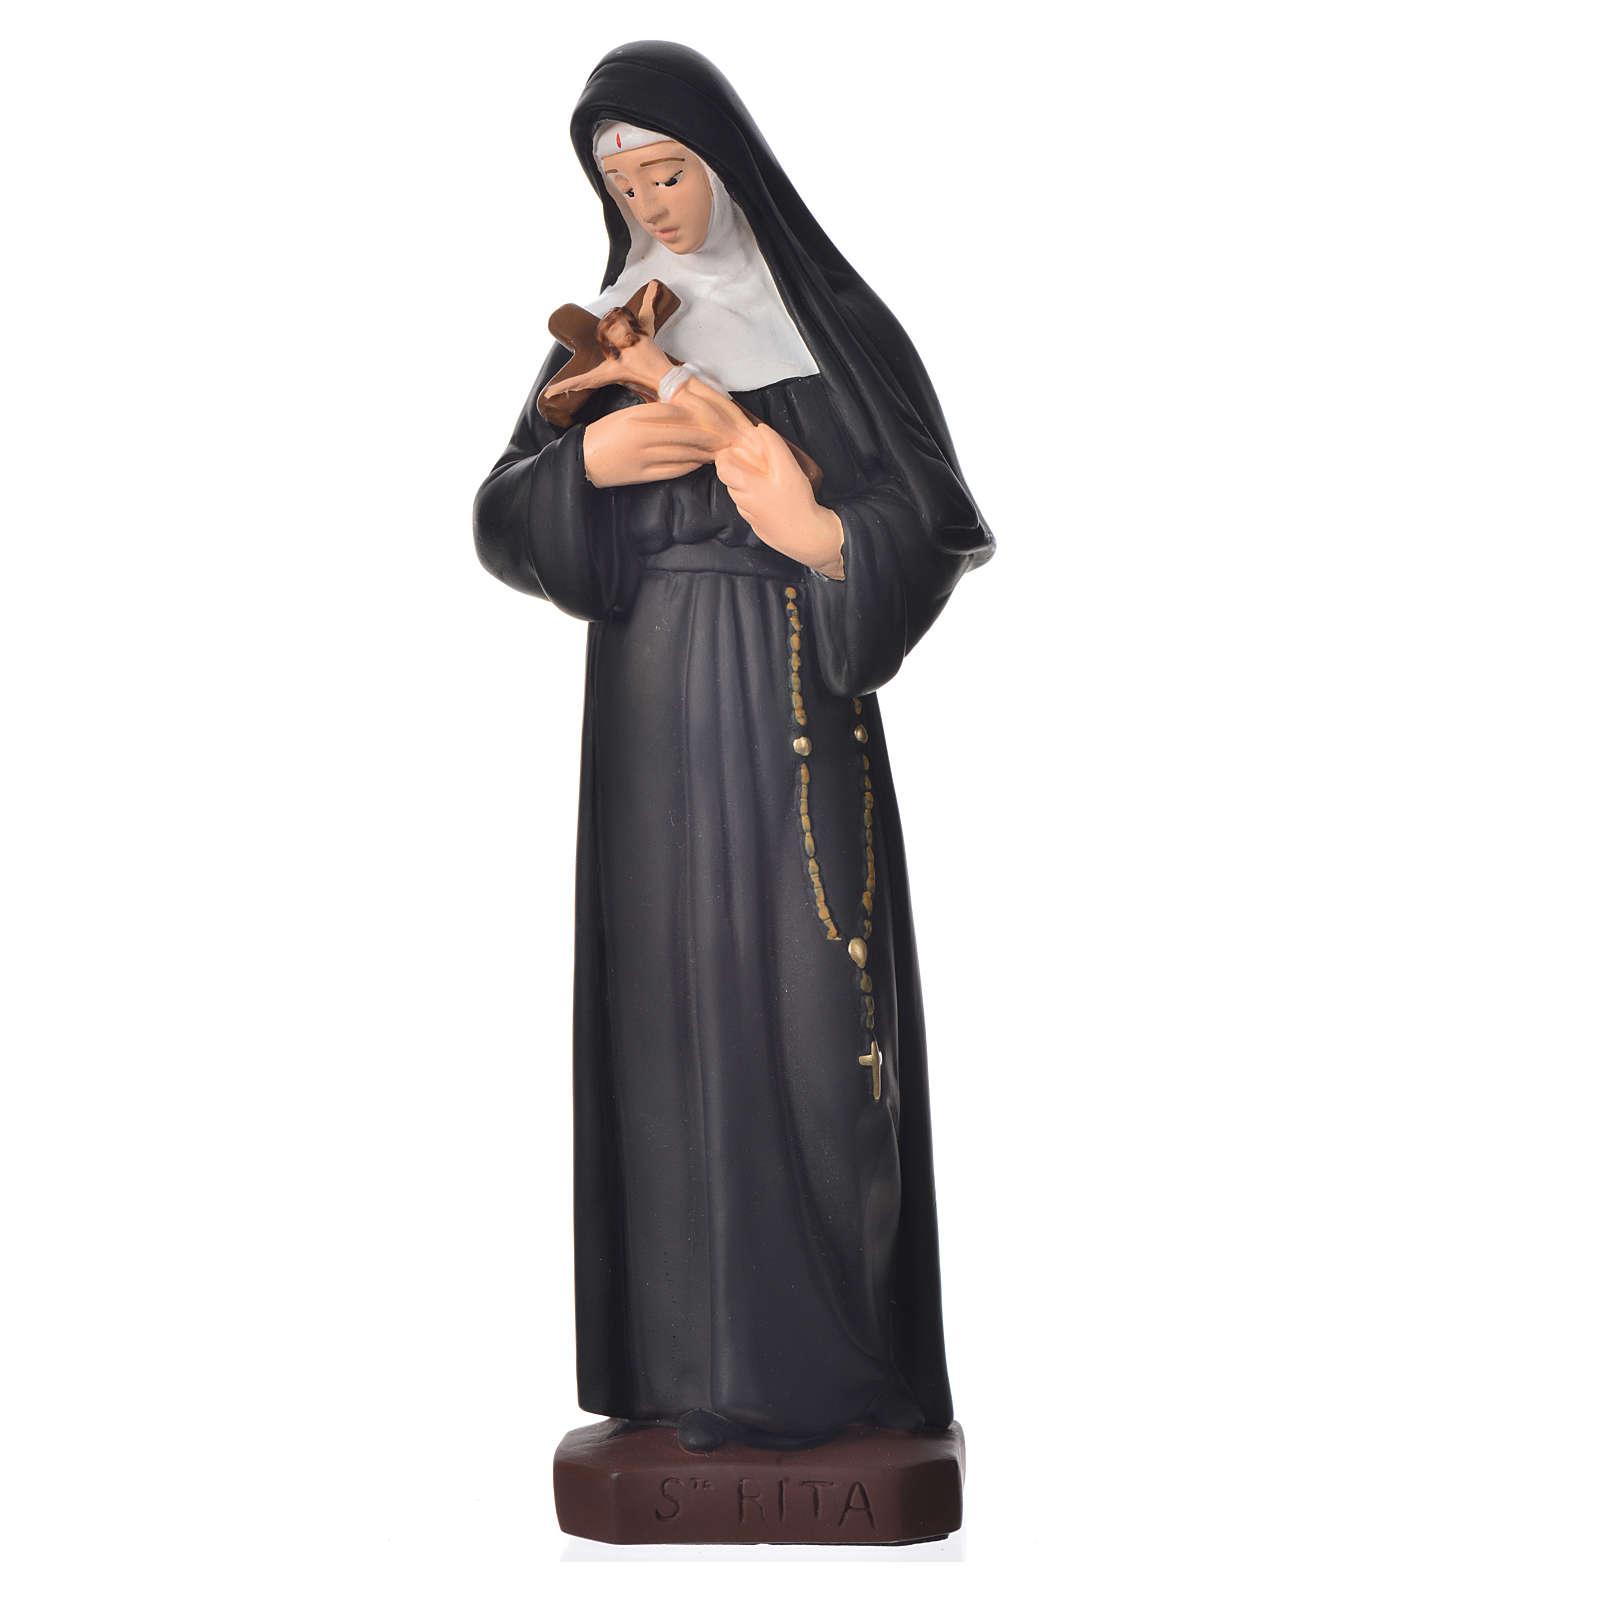 Saint Rita statue 30cm, unbreakable material 4